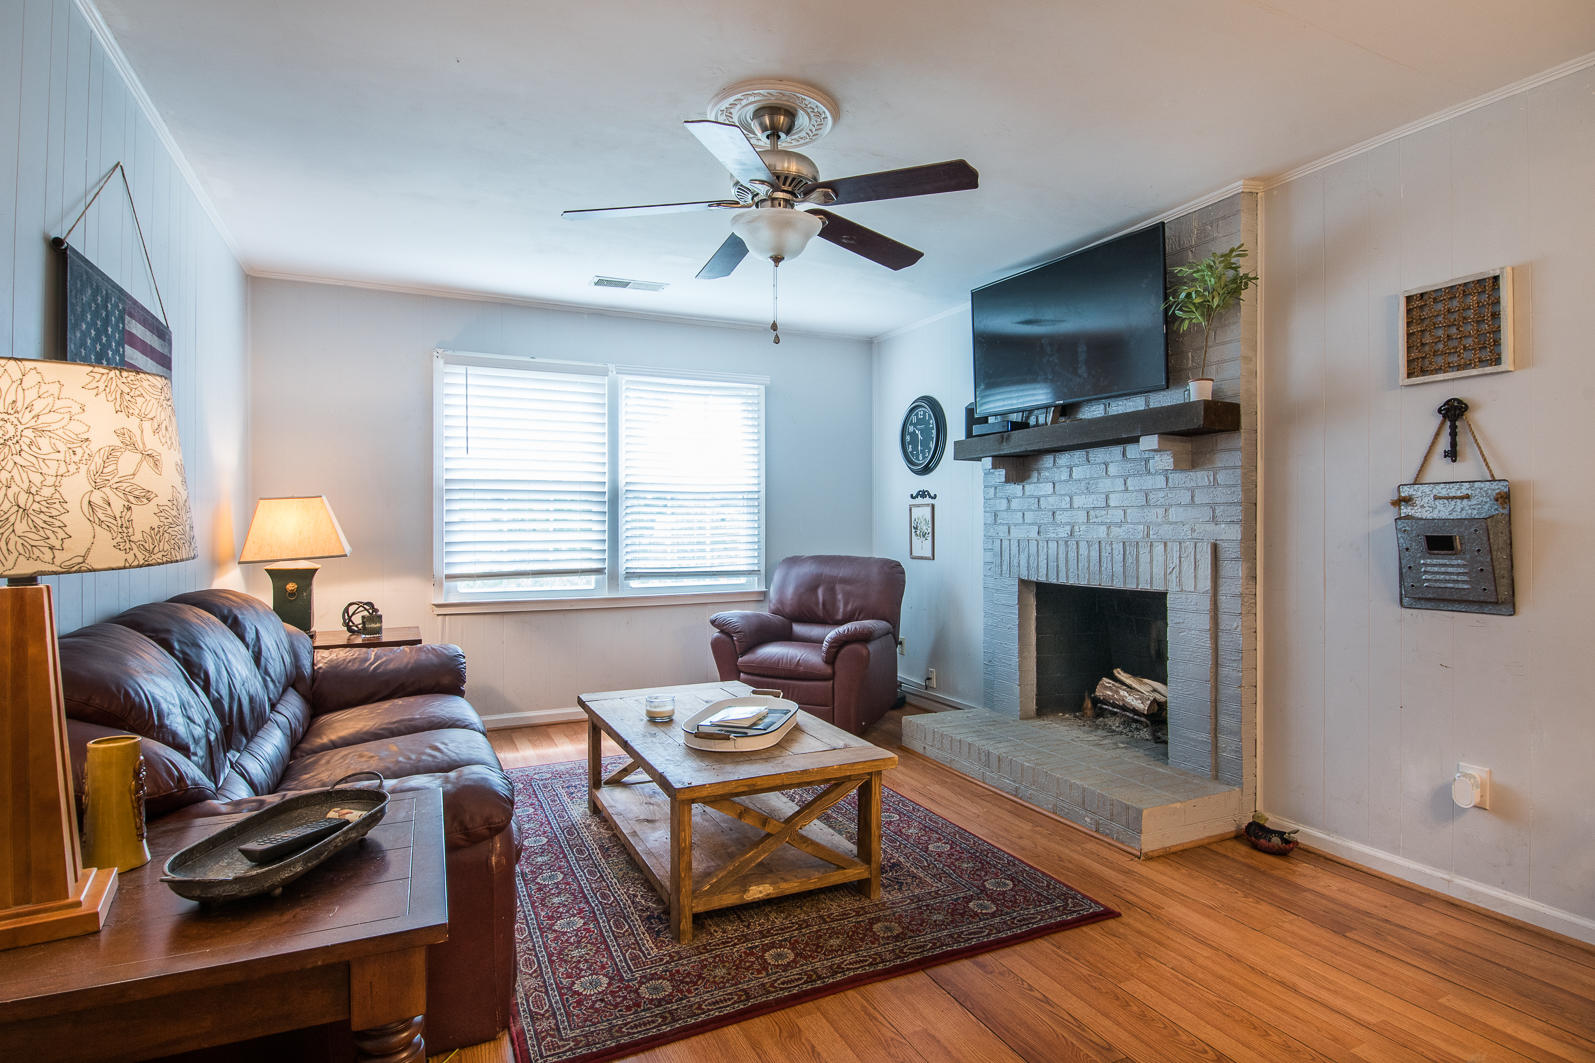 Wando East Homes For Sale - 1605 Babington, Mount Pleasant, SC - 28